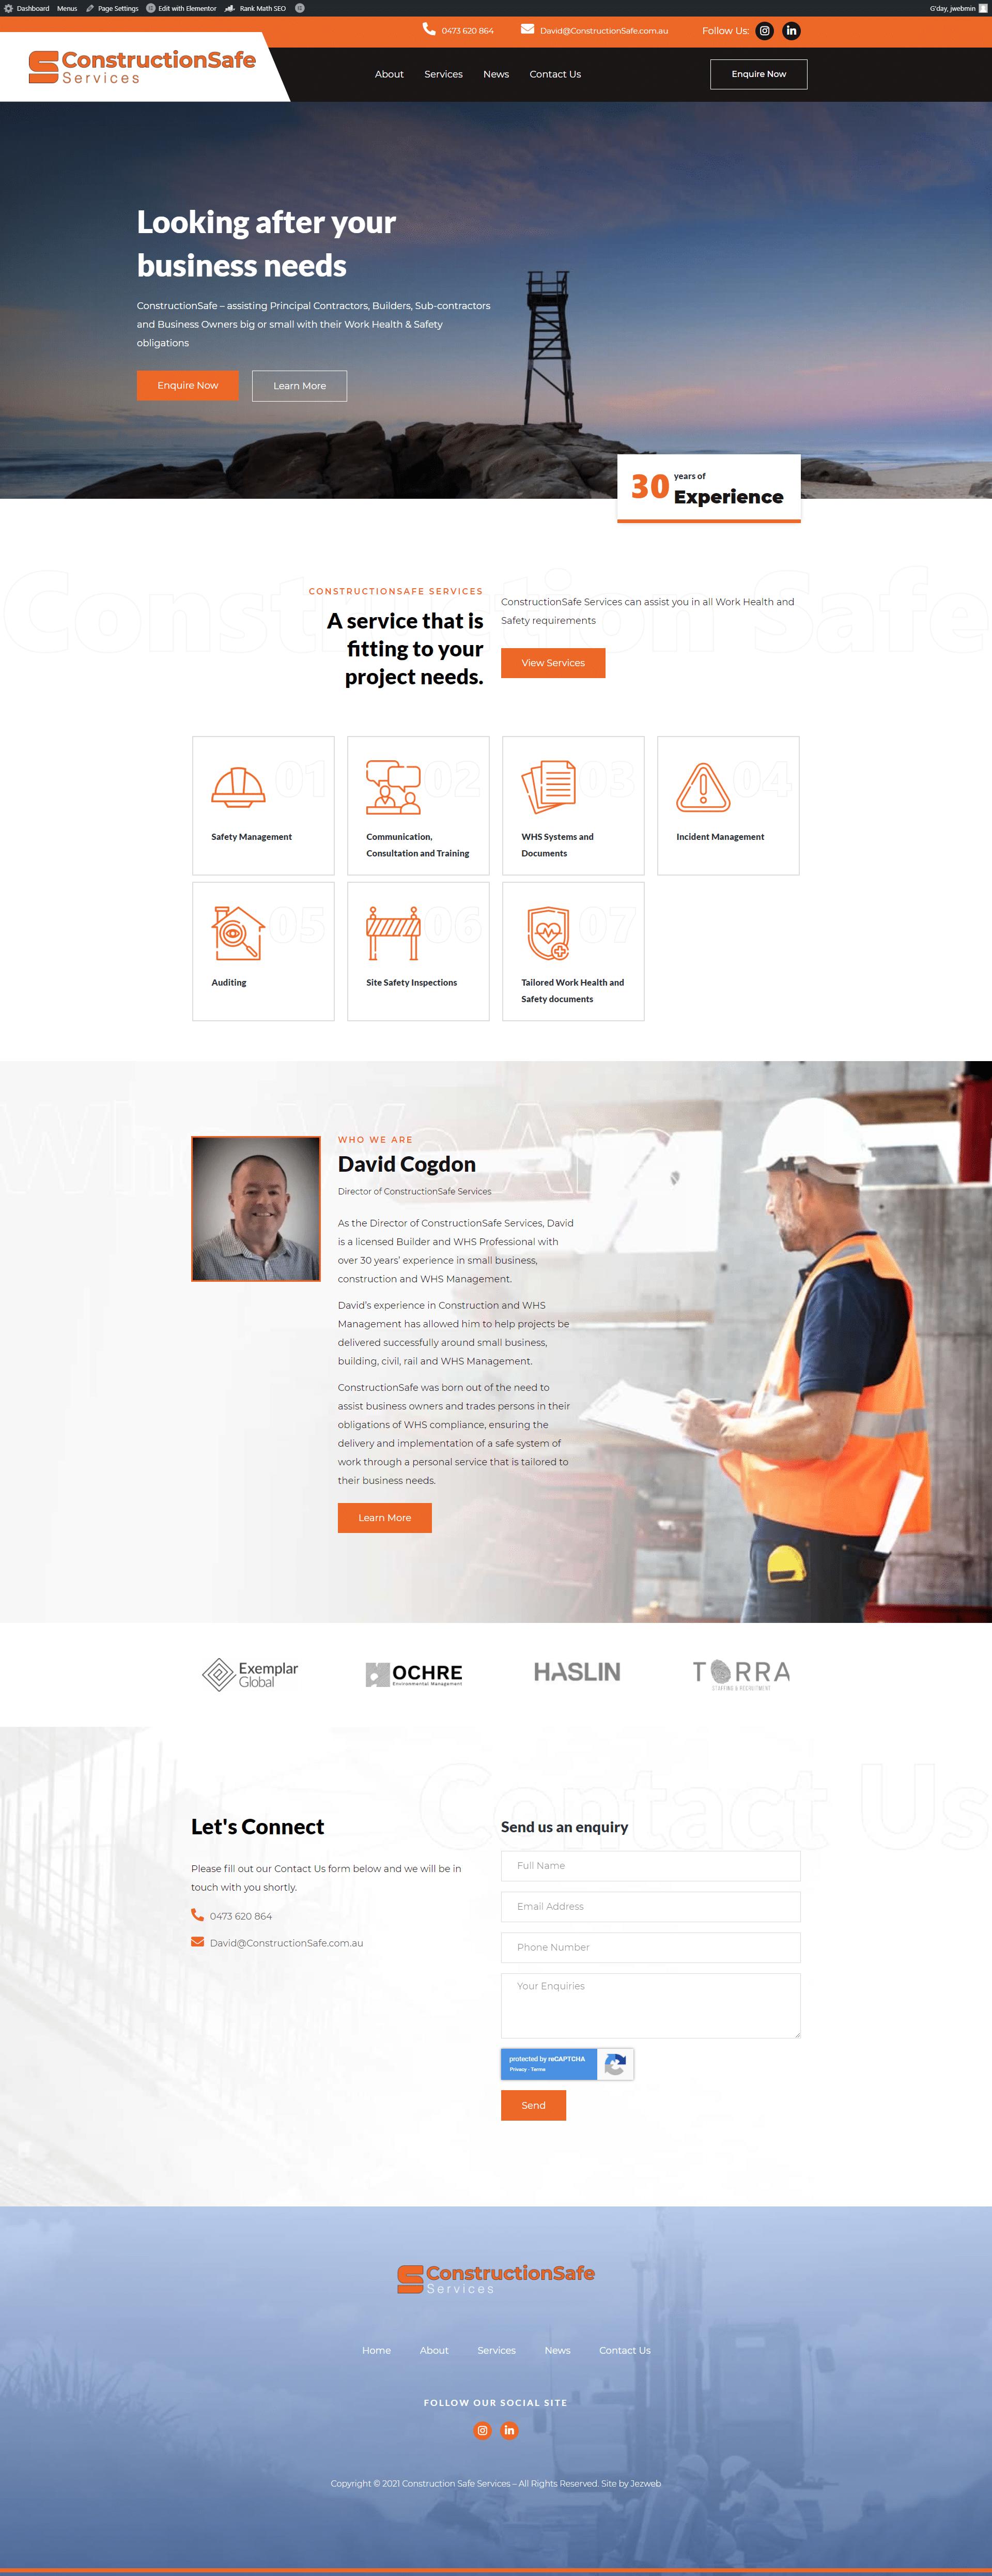 ConstructionSafe -